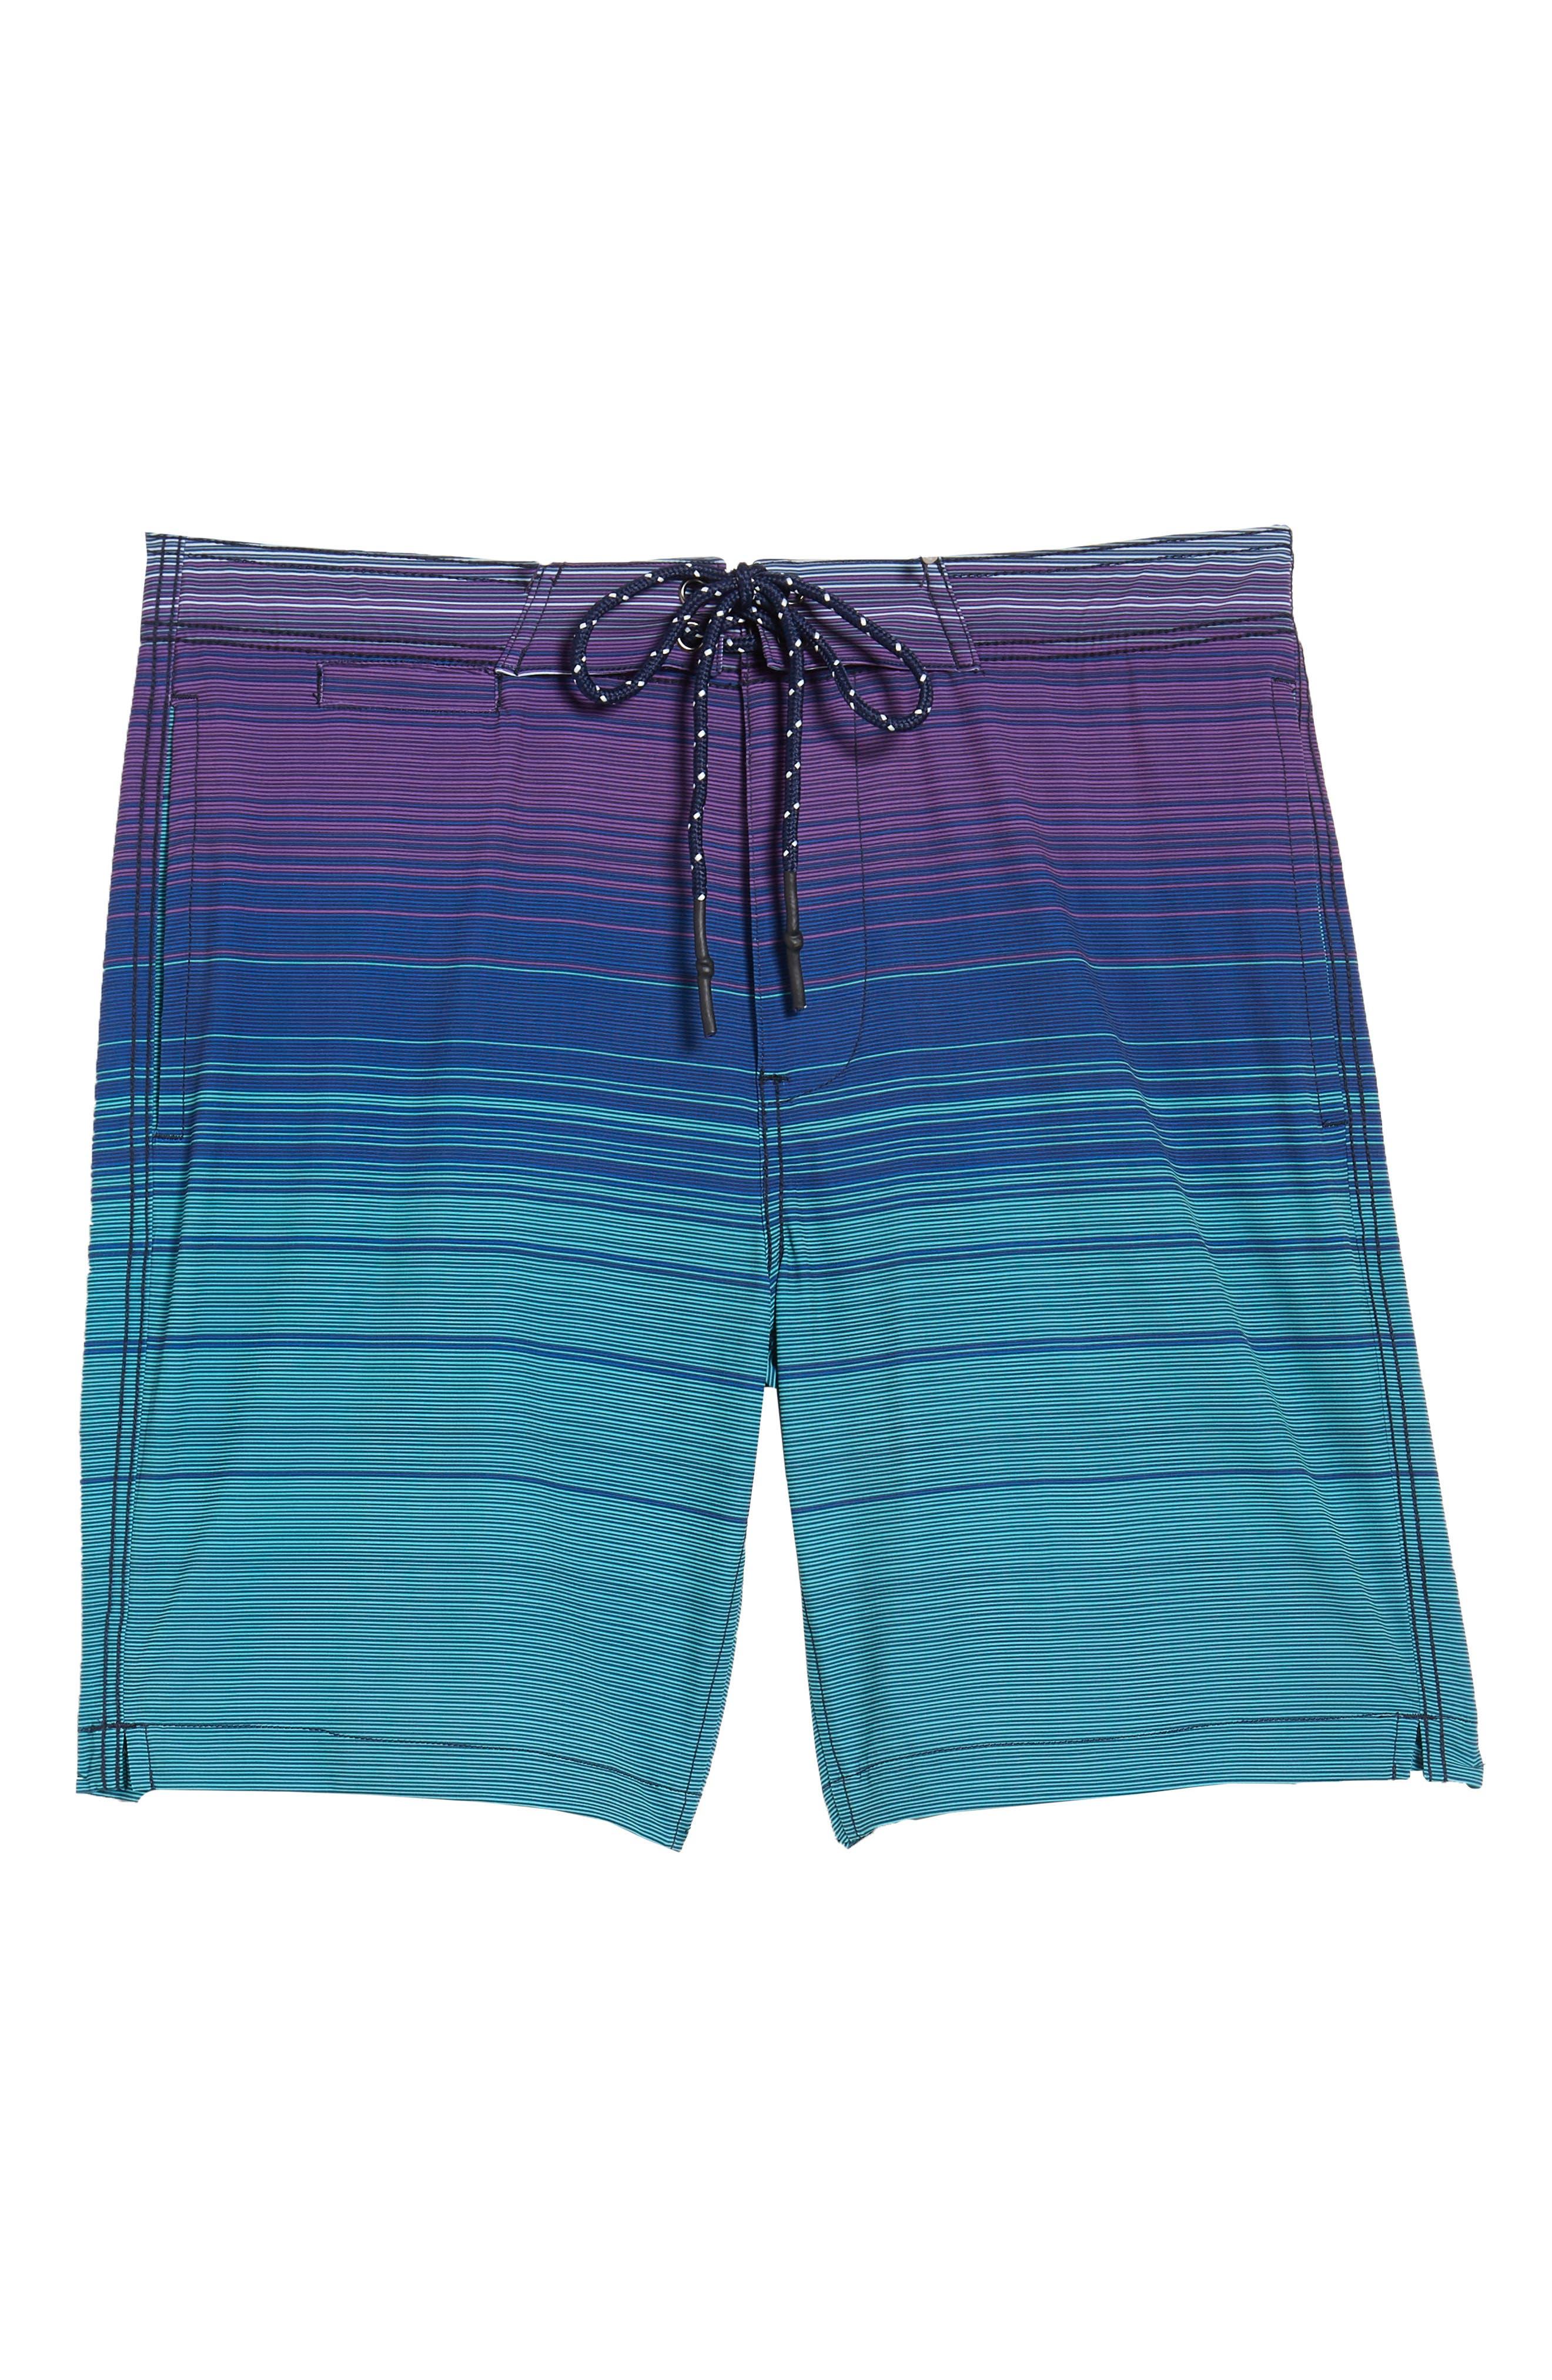 Ombré Stretch Stripe Board Shorts,                             Alternate thumbnail 6, color,                             071